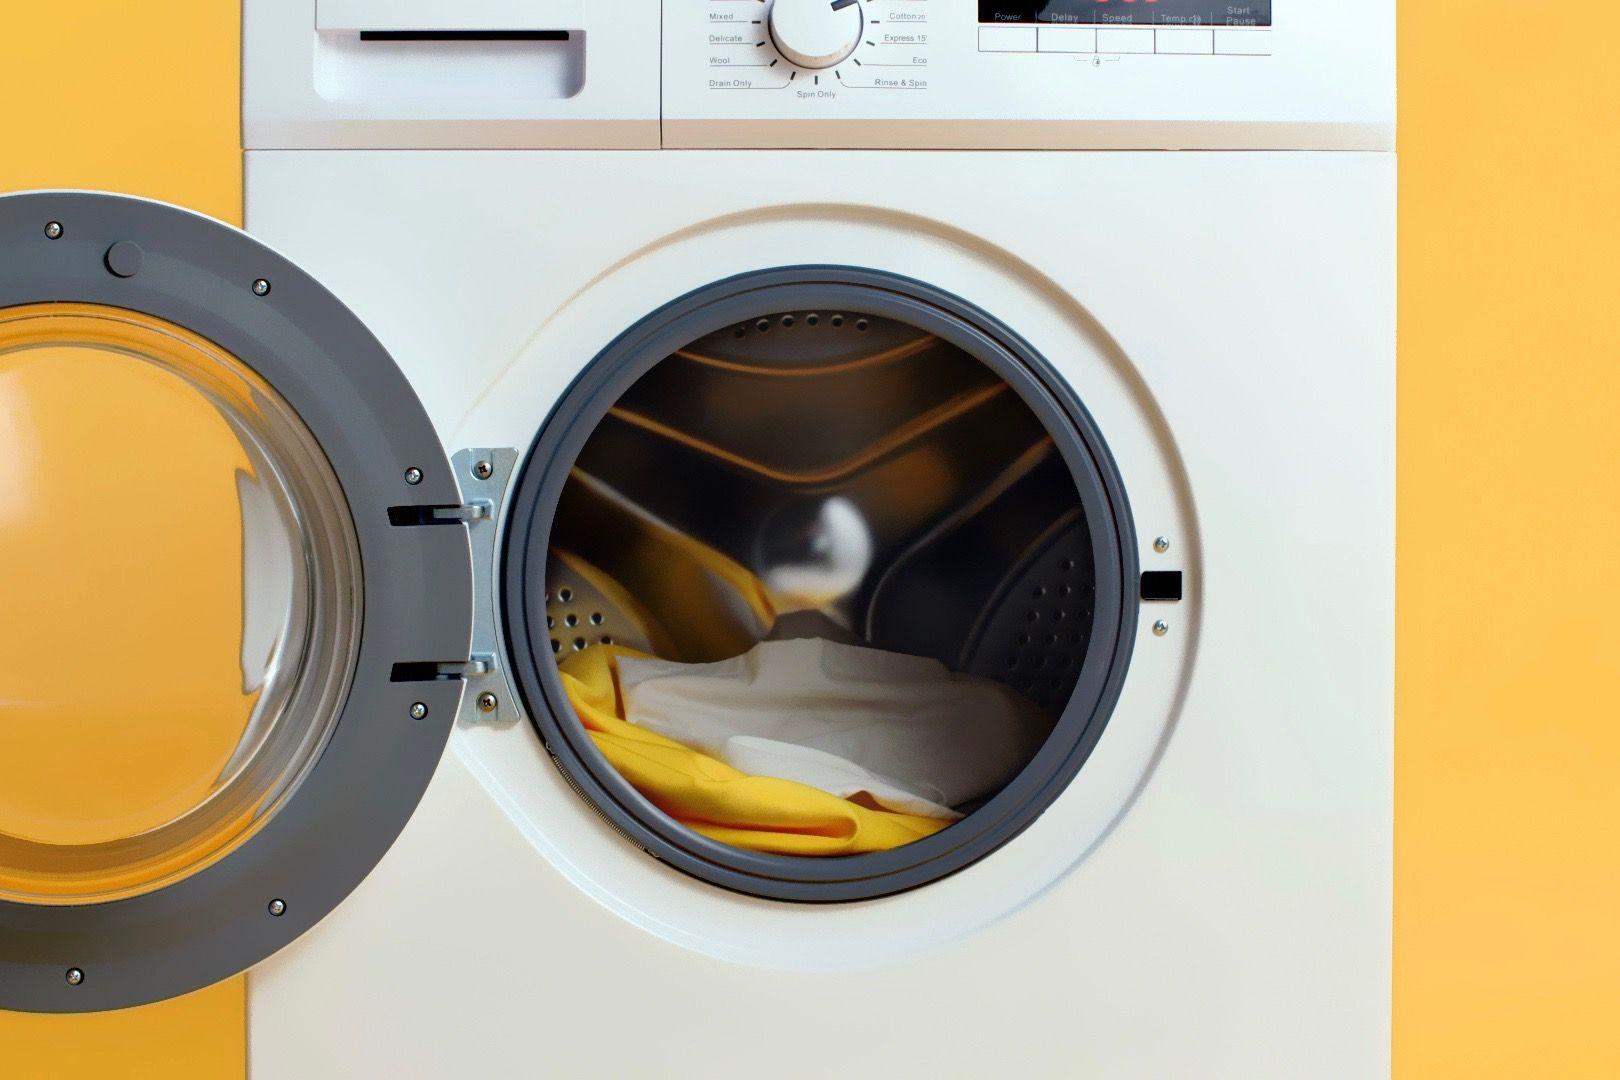 Step 3: A washing machine